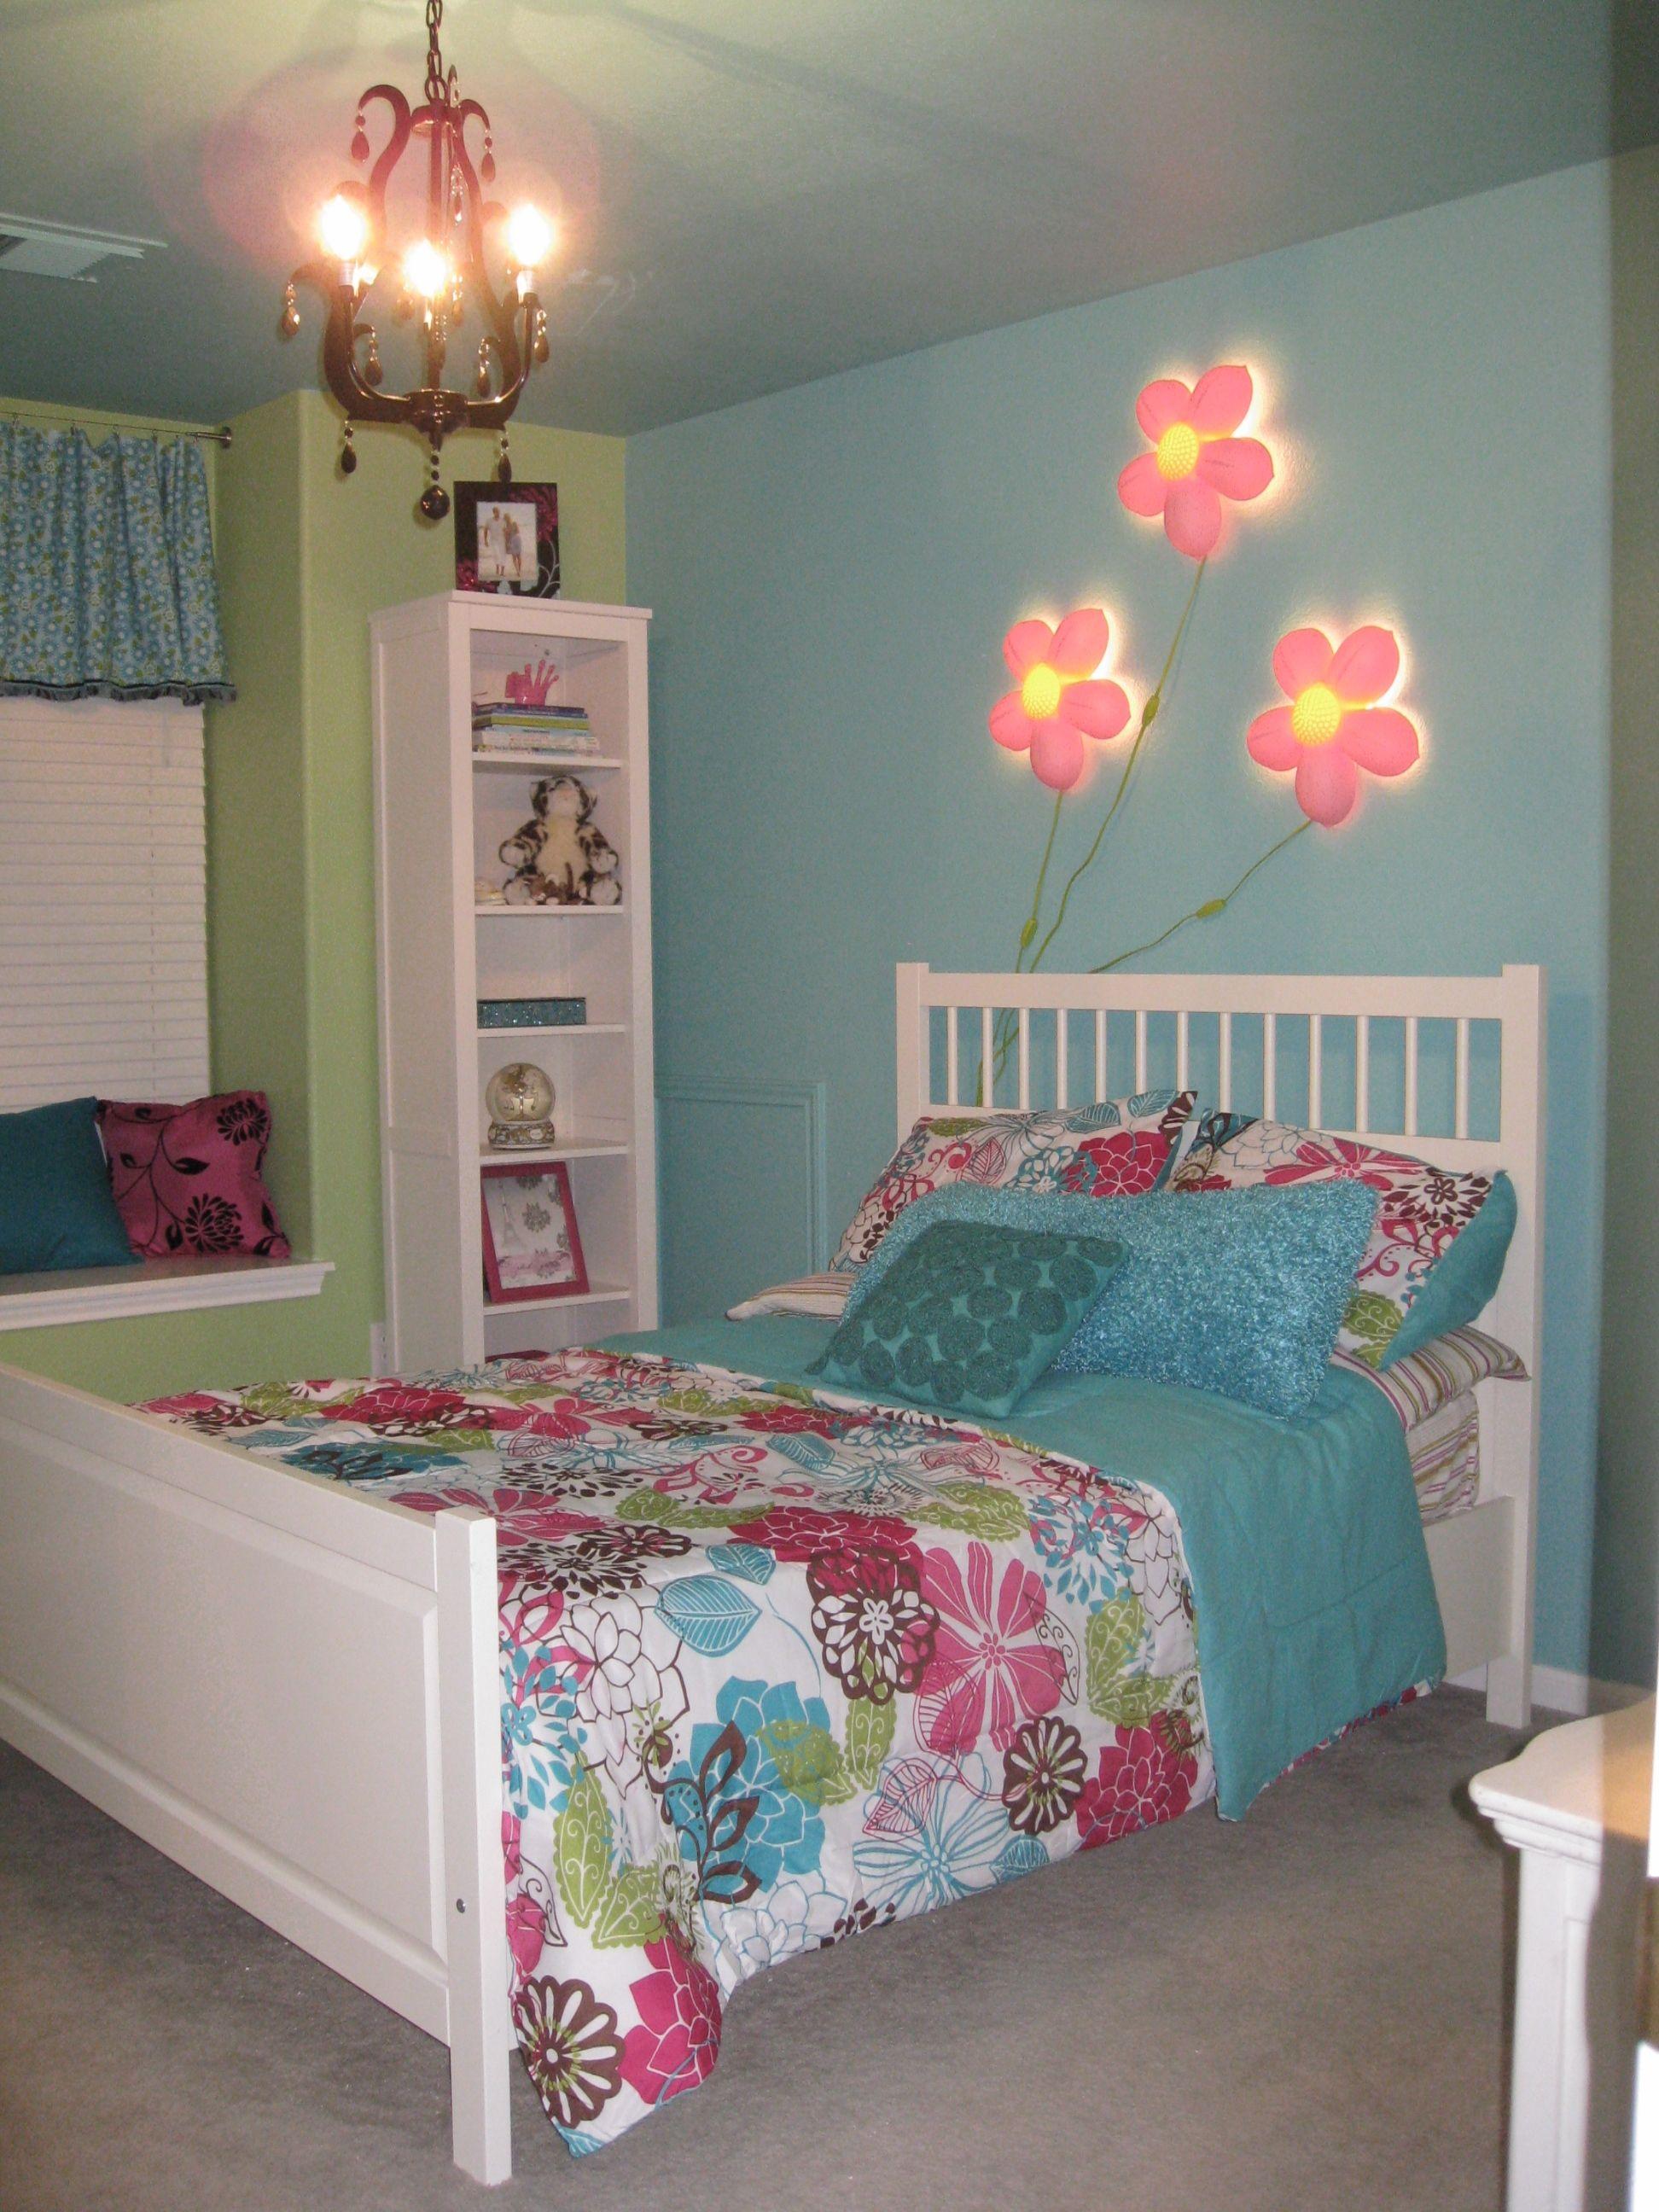 Girls bedroom ideas Girls bedroom ideas